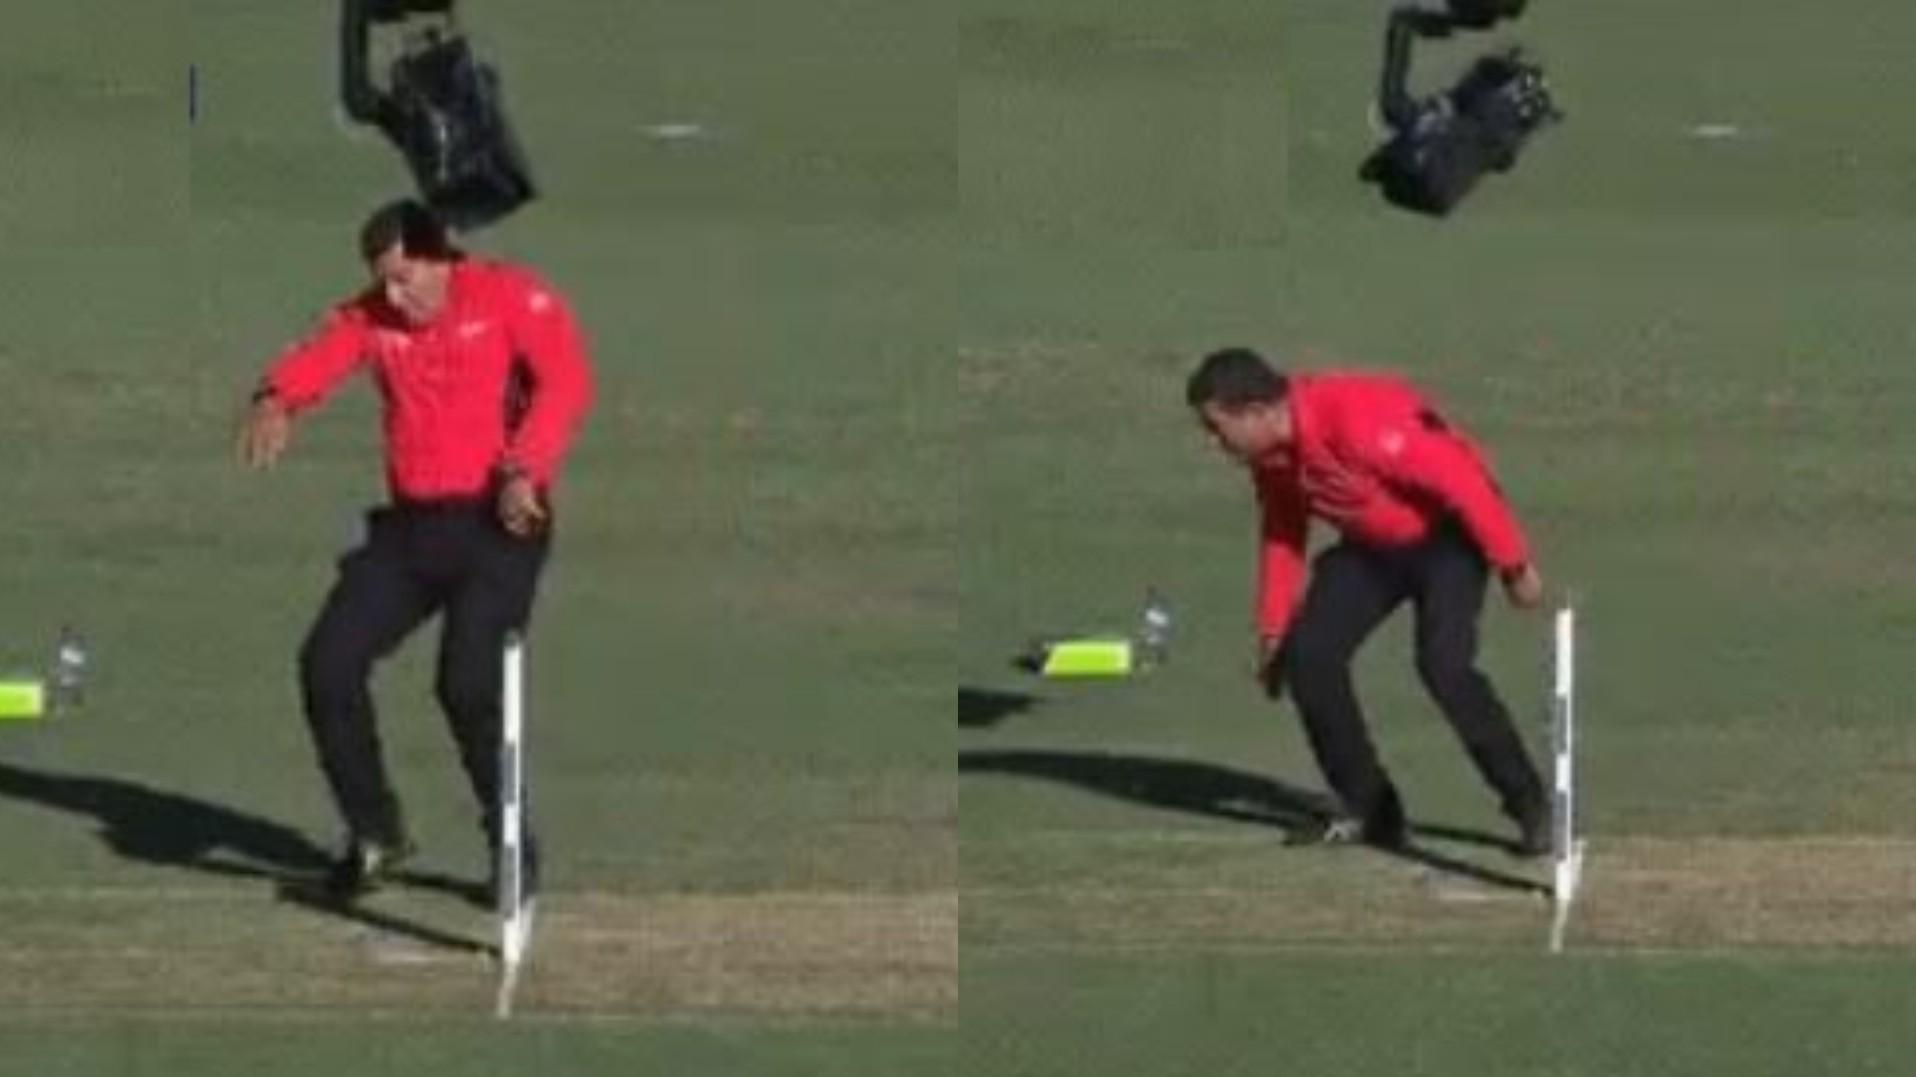 AUS v IND 2020-21: Twitterverse have a field day after Aussie umpire crashes into spider-cam